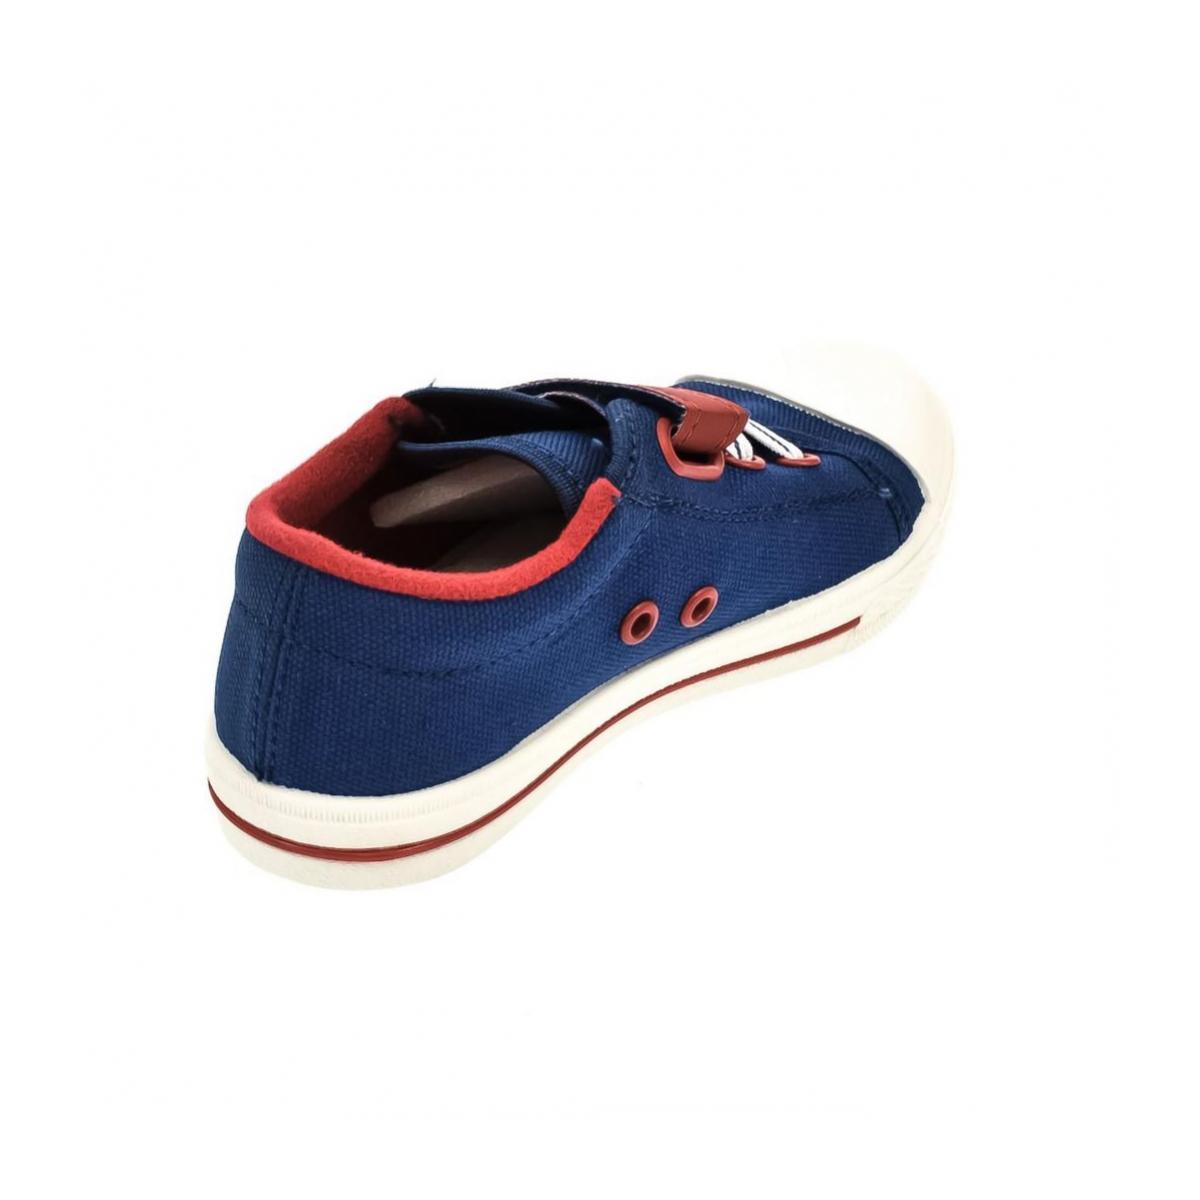 cbe8fddbda40c Detské tmavomodré topánky DISNEY | Johnc.sk